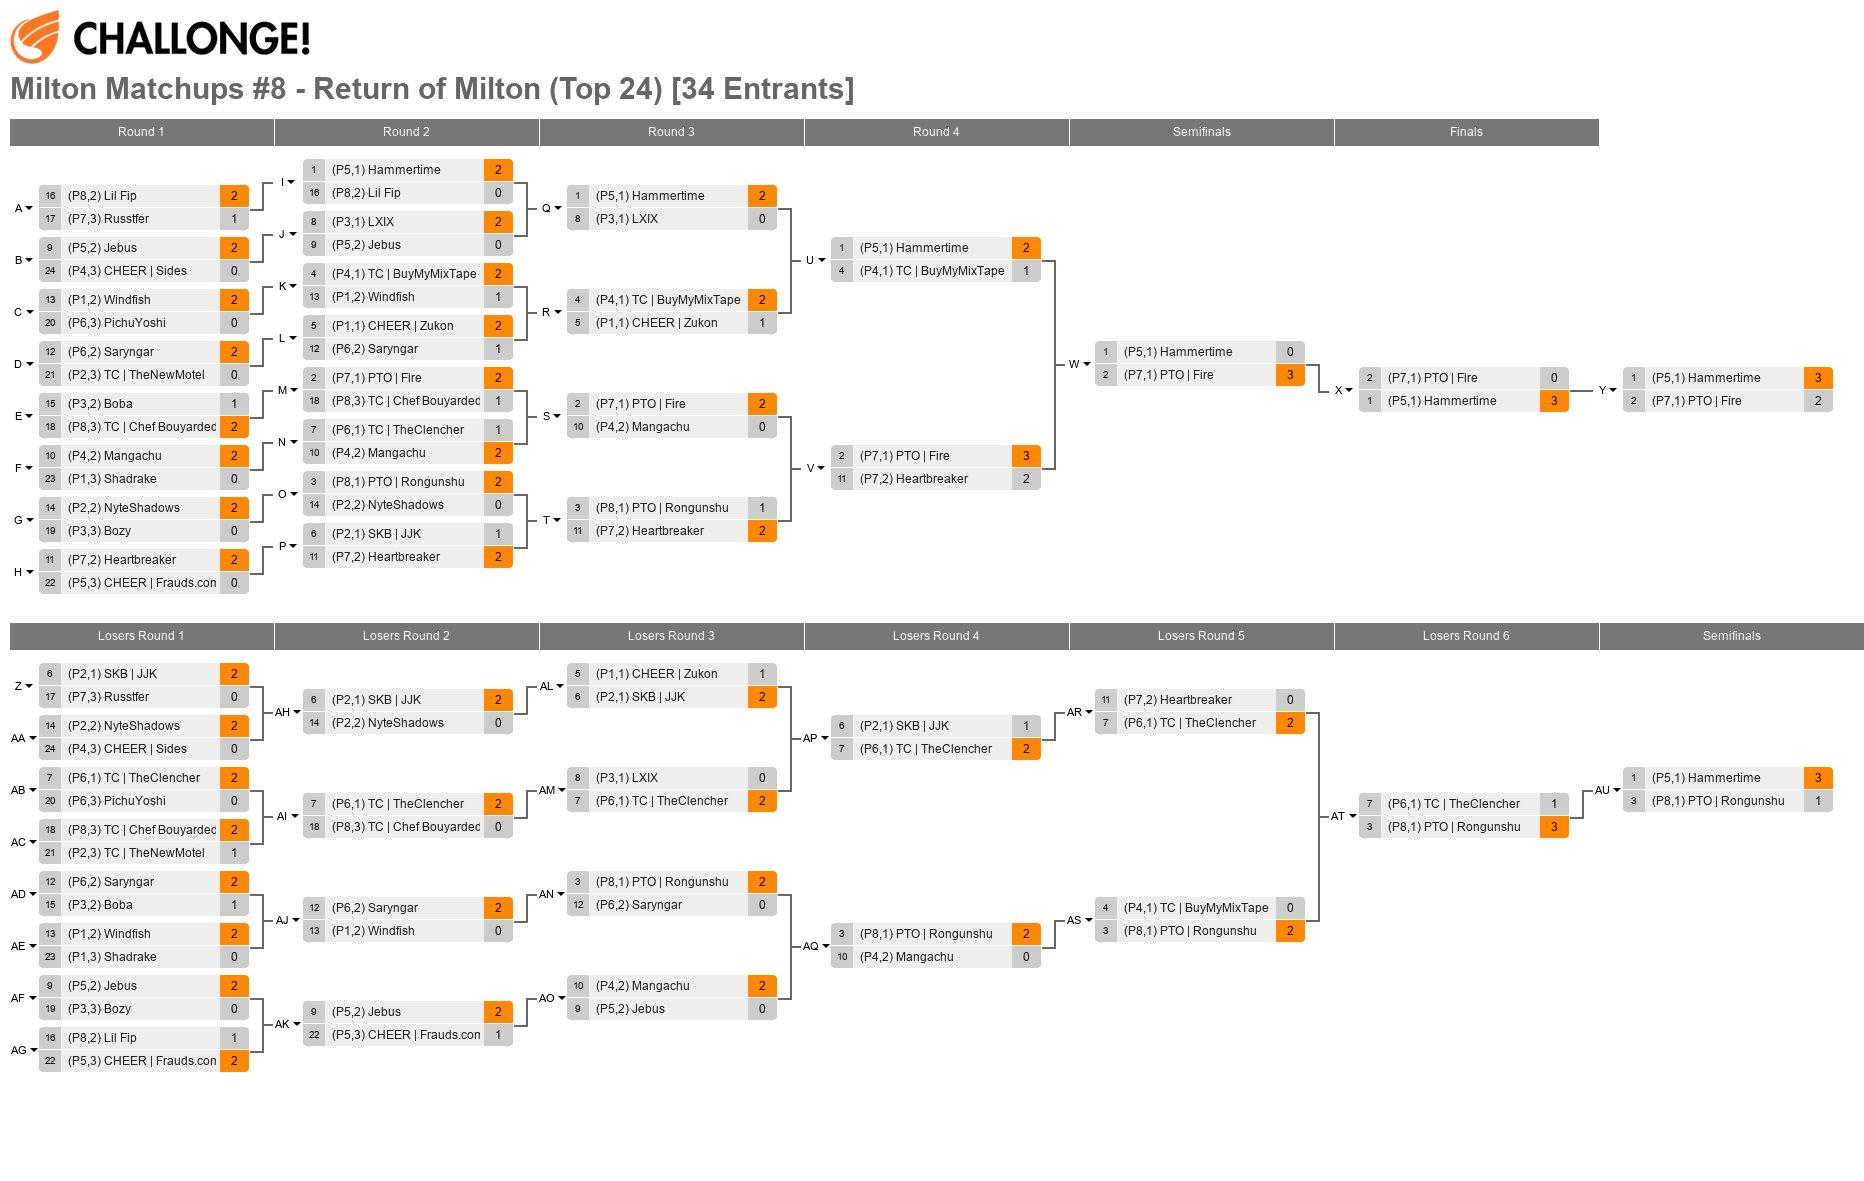 Milton Matchups #8 - Return of Milton (Top 24) [34 Entrants]